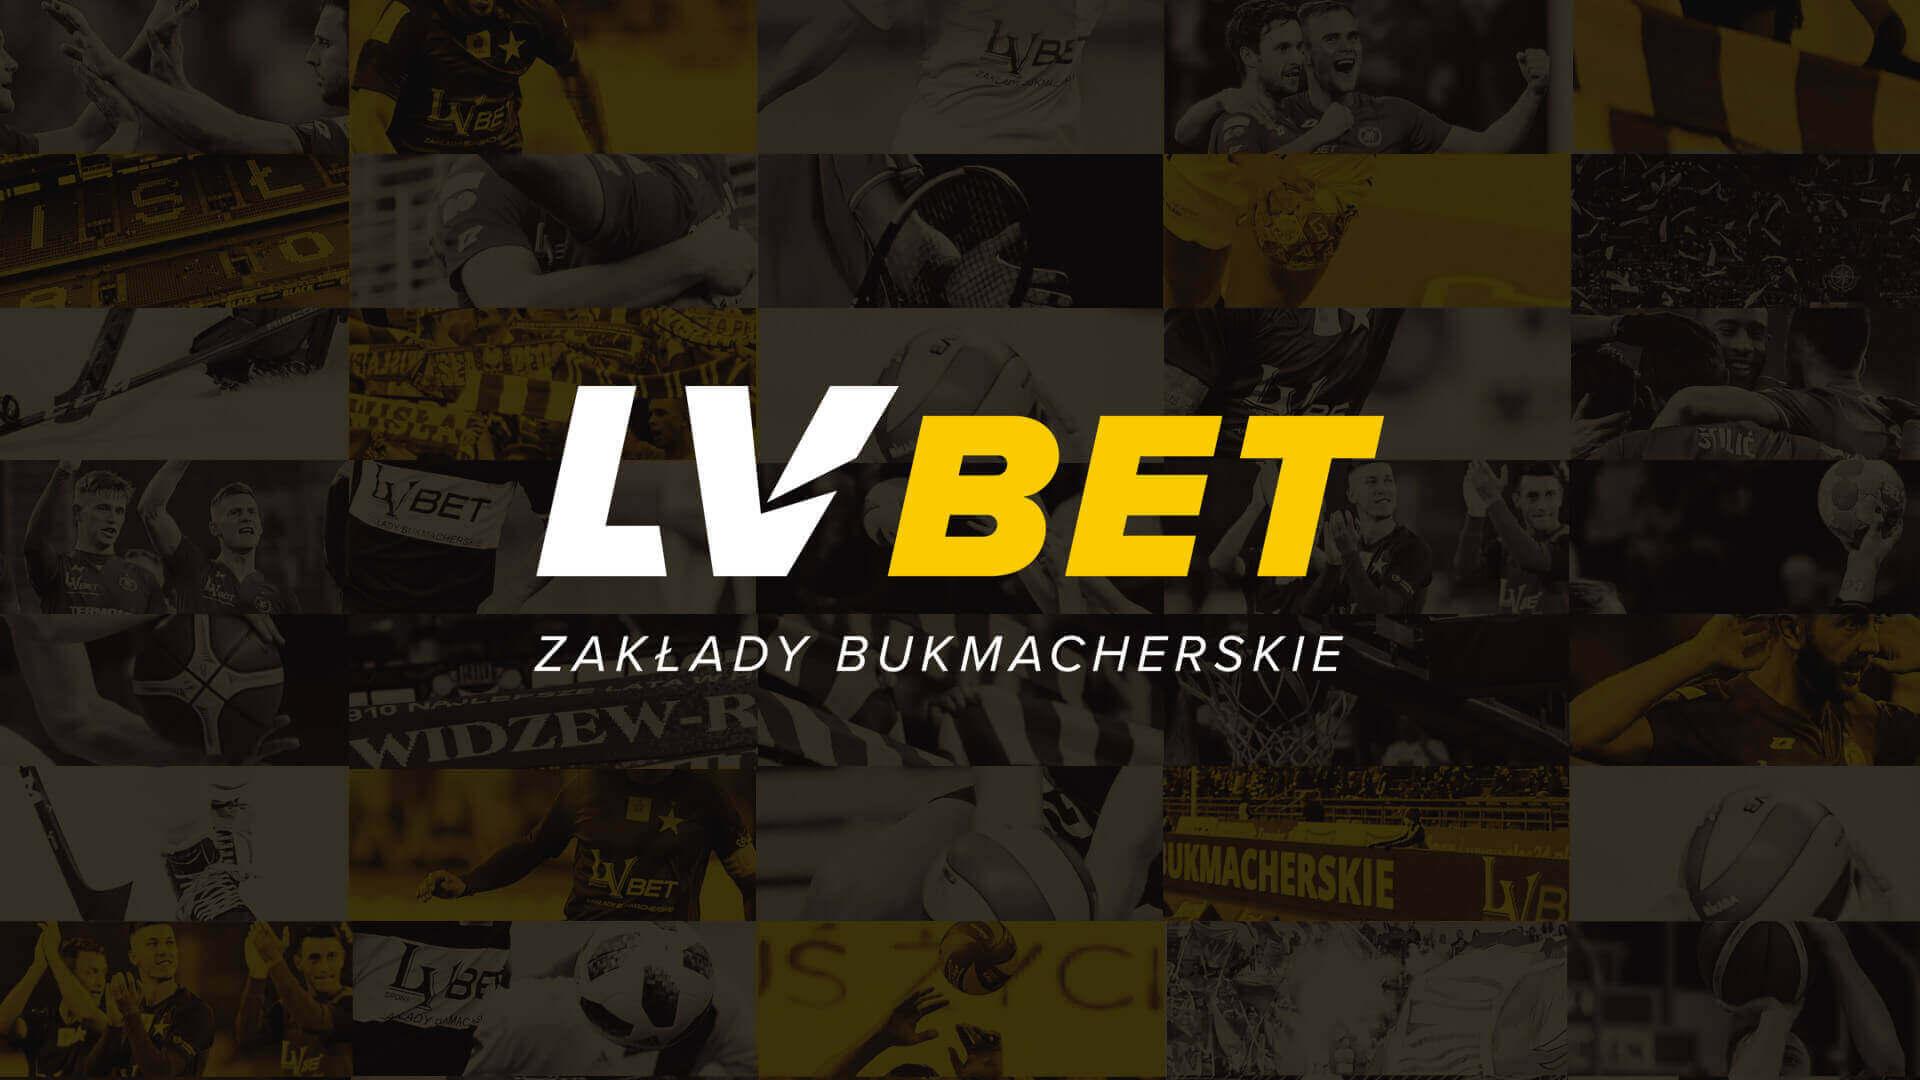 polska legalna strona bukmacherska lv bet